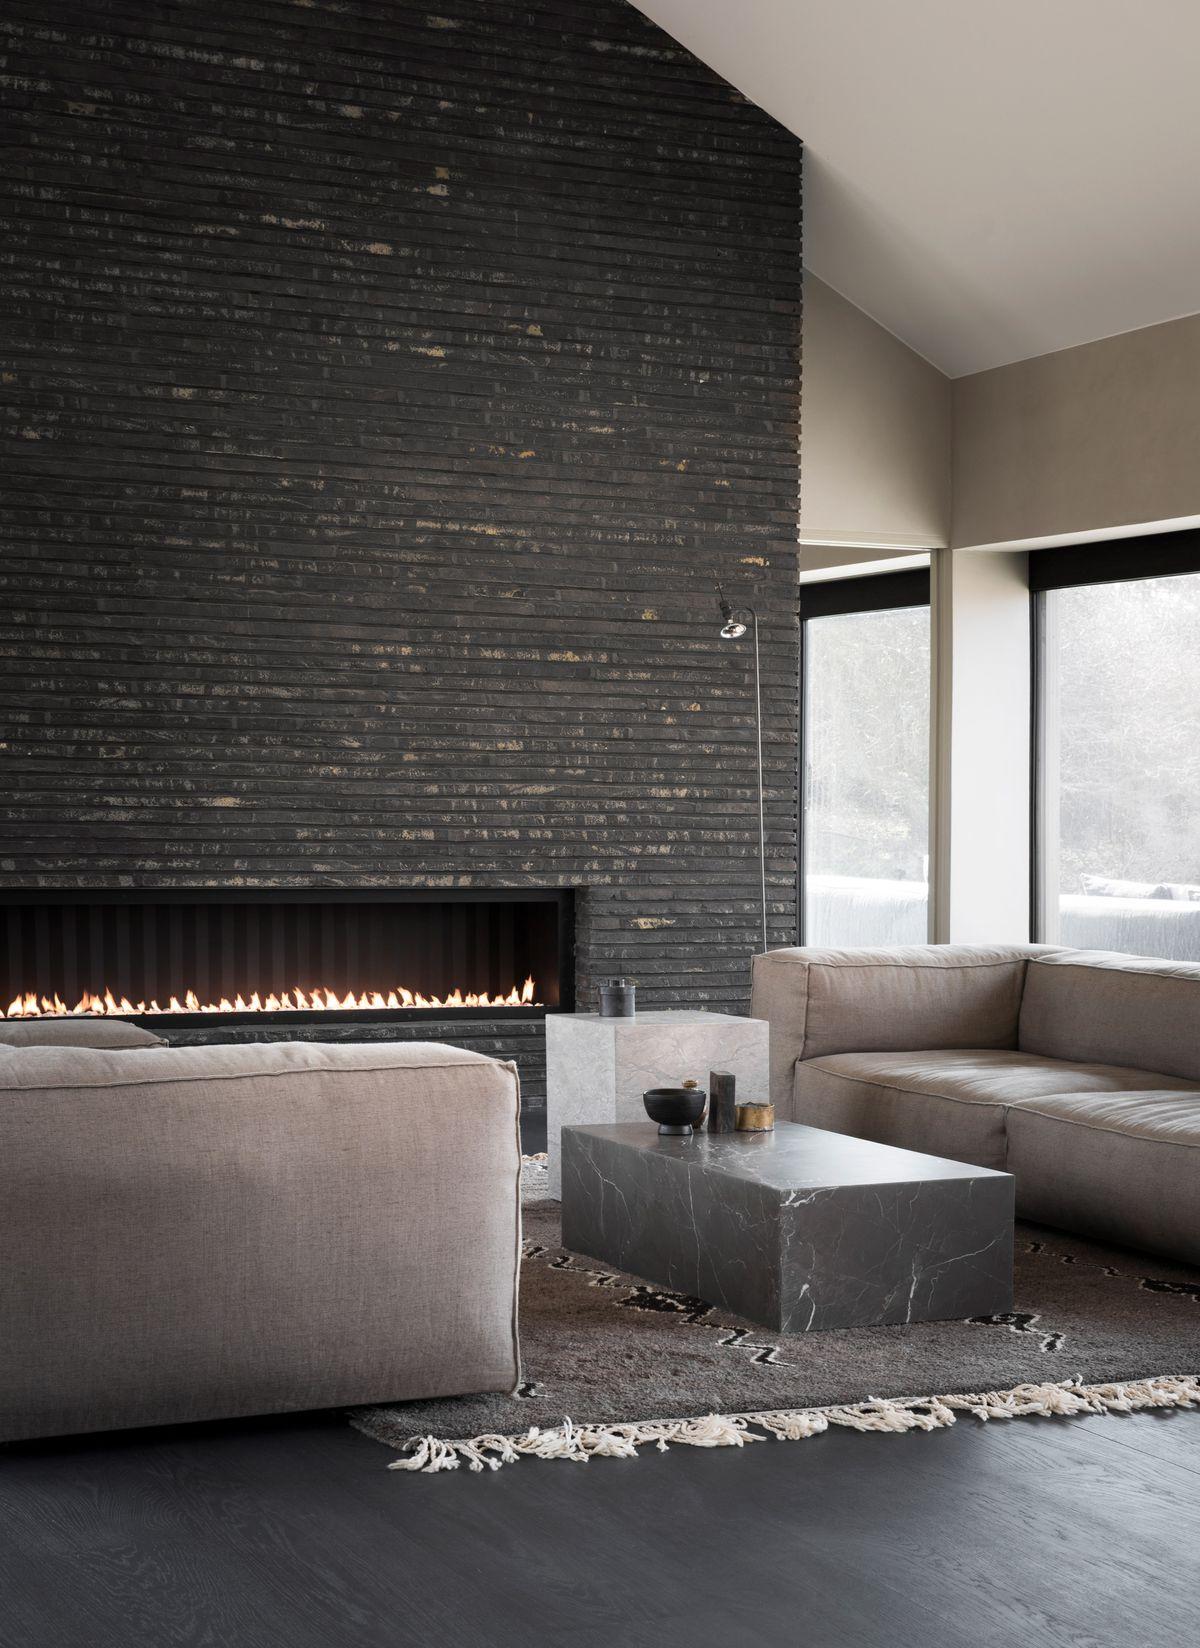 Black brick fireplace with sofa